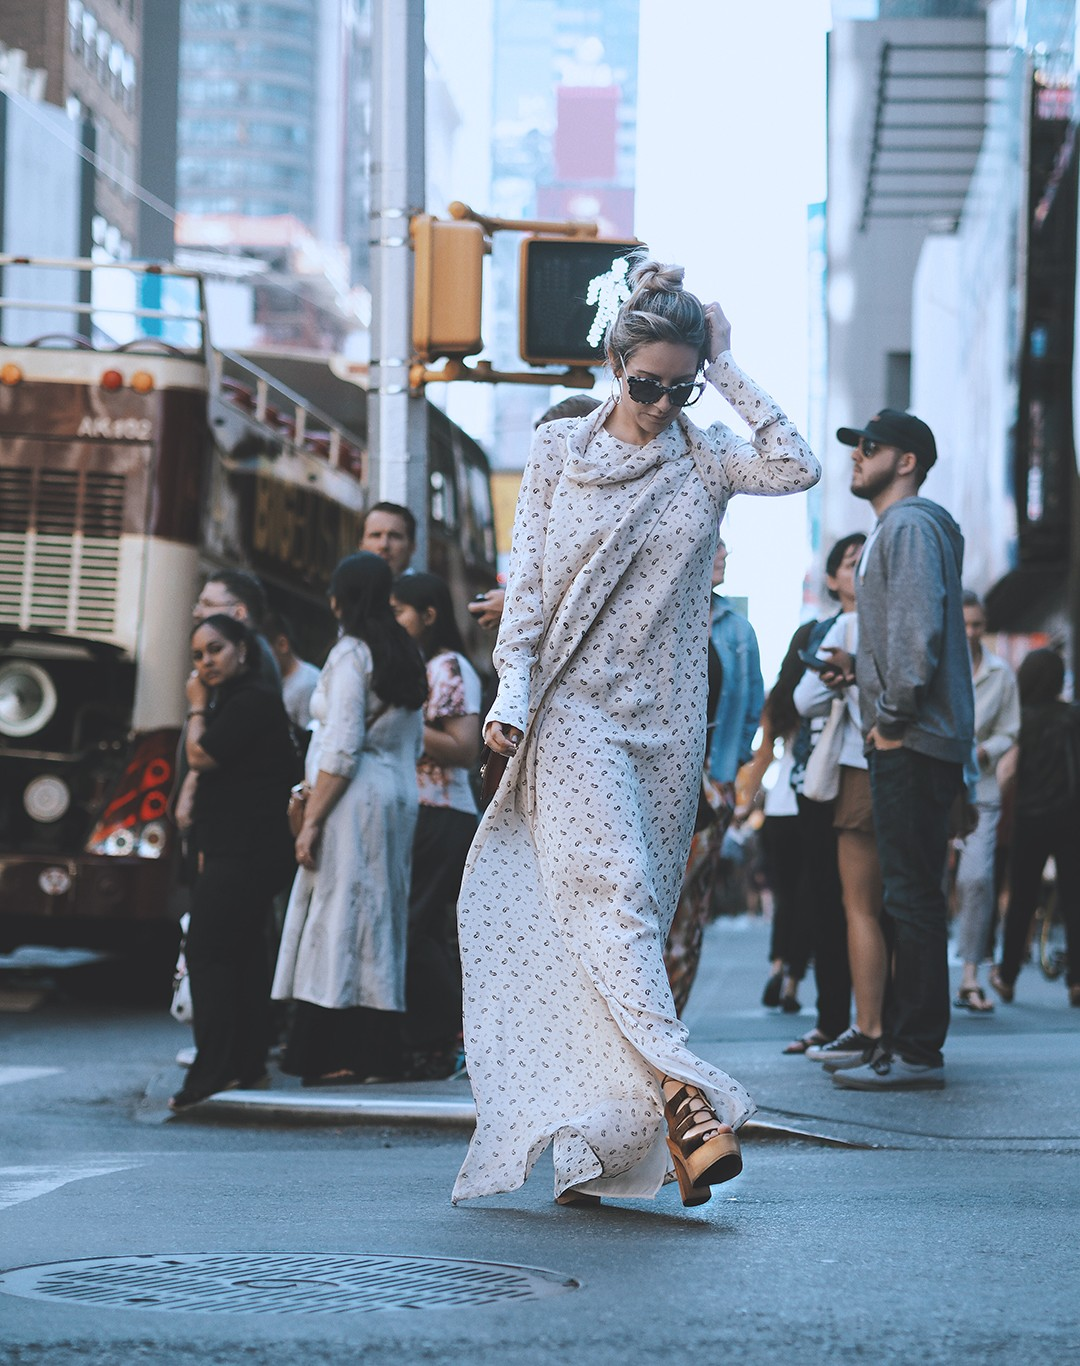 ny-fashion-blogger-2016img_9328